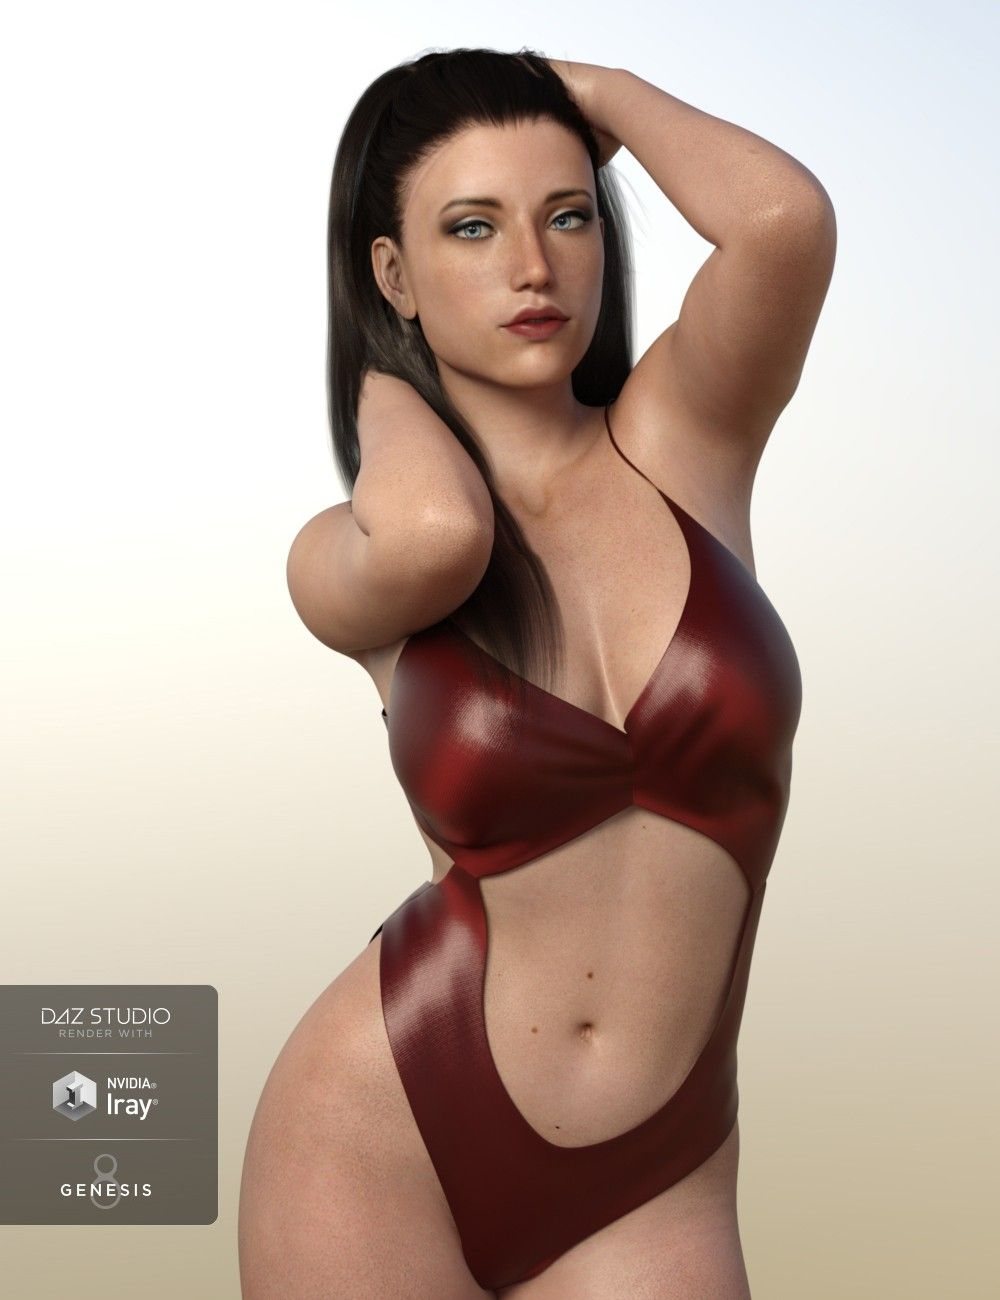 Rachel for Genesis 8 Female by Cherubit for DAZ Studio by DAZ 3D